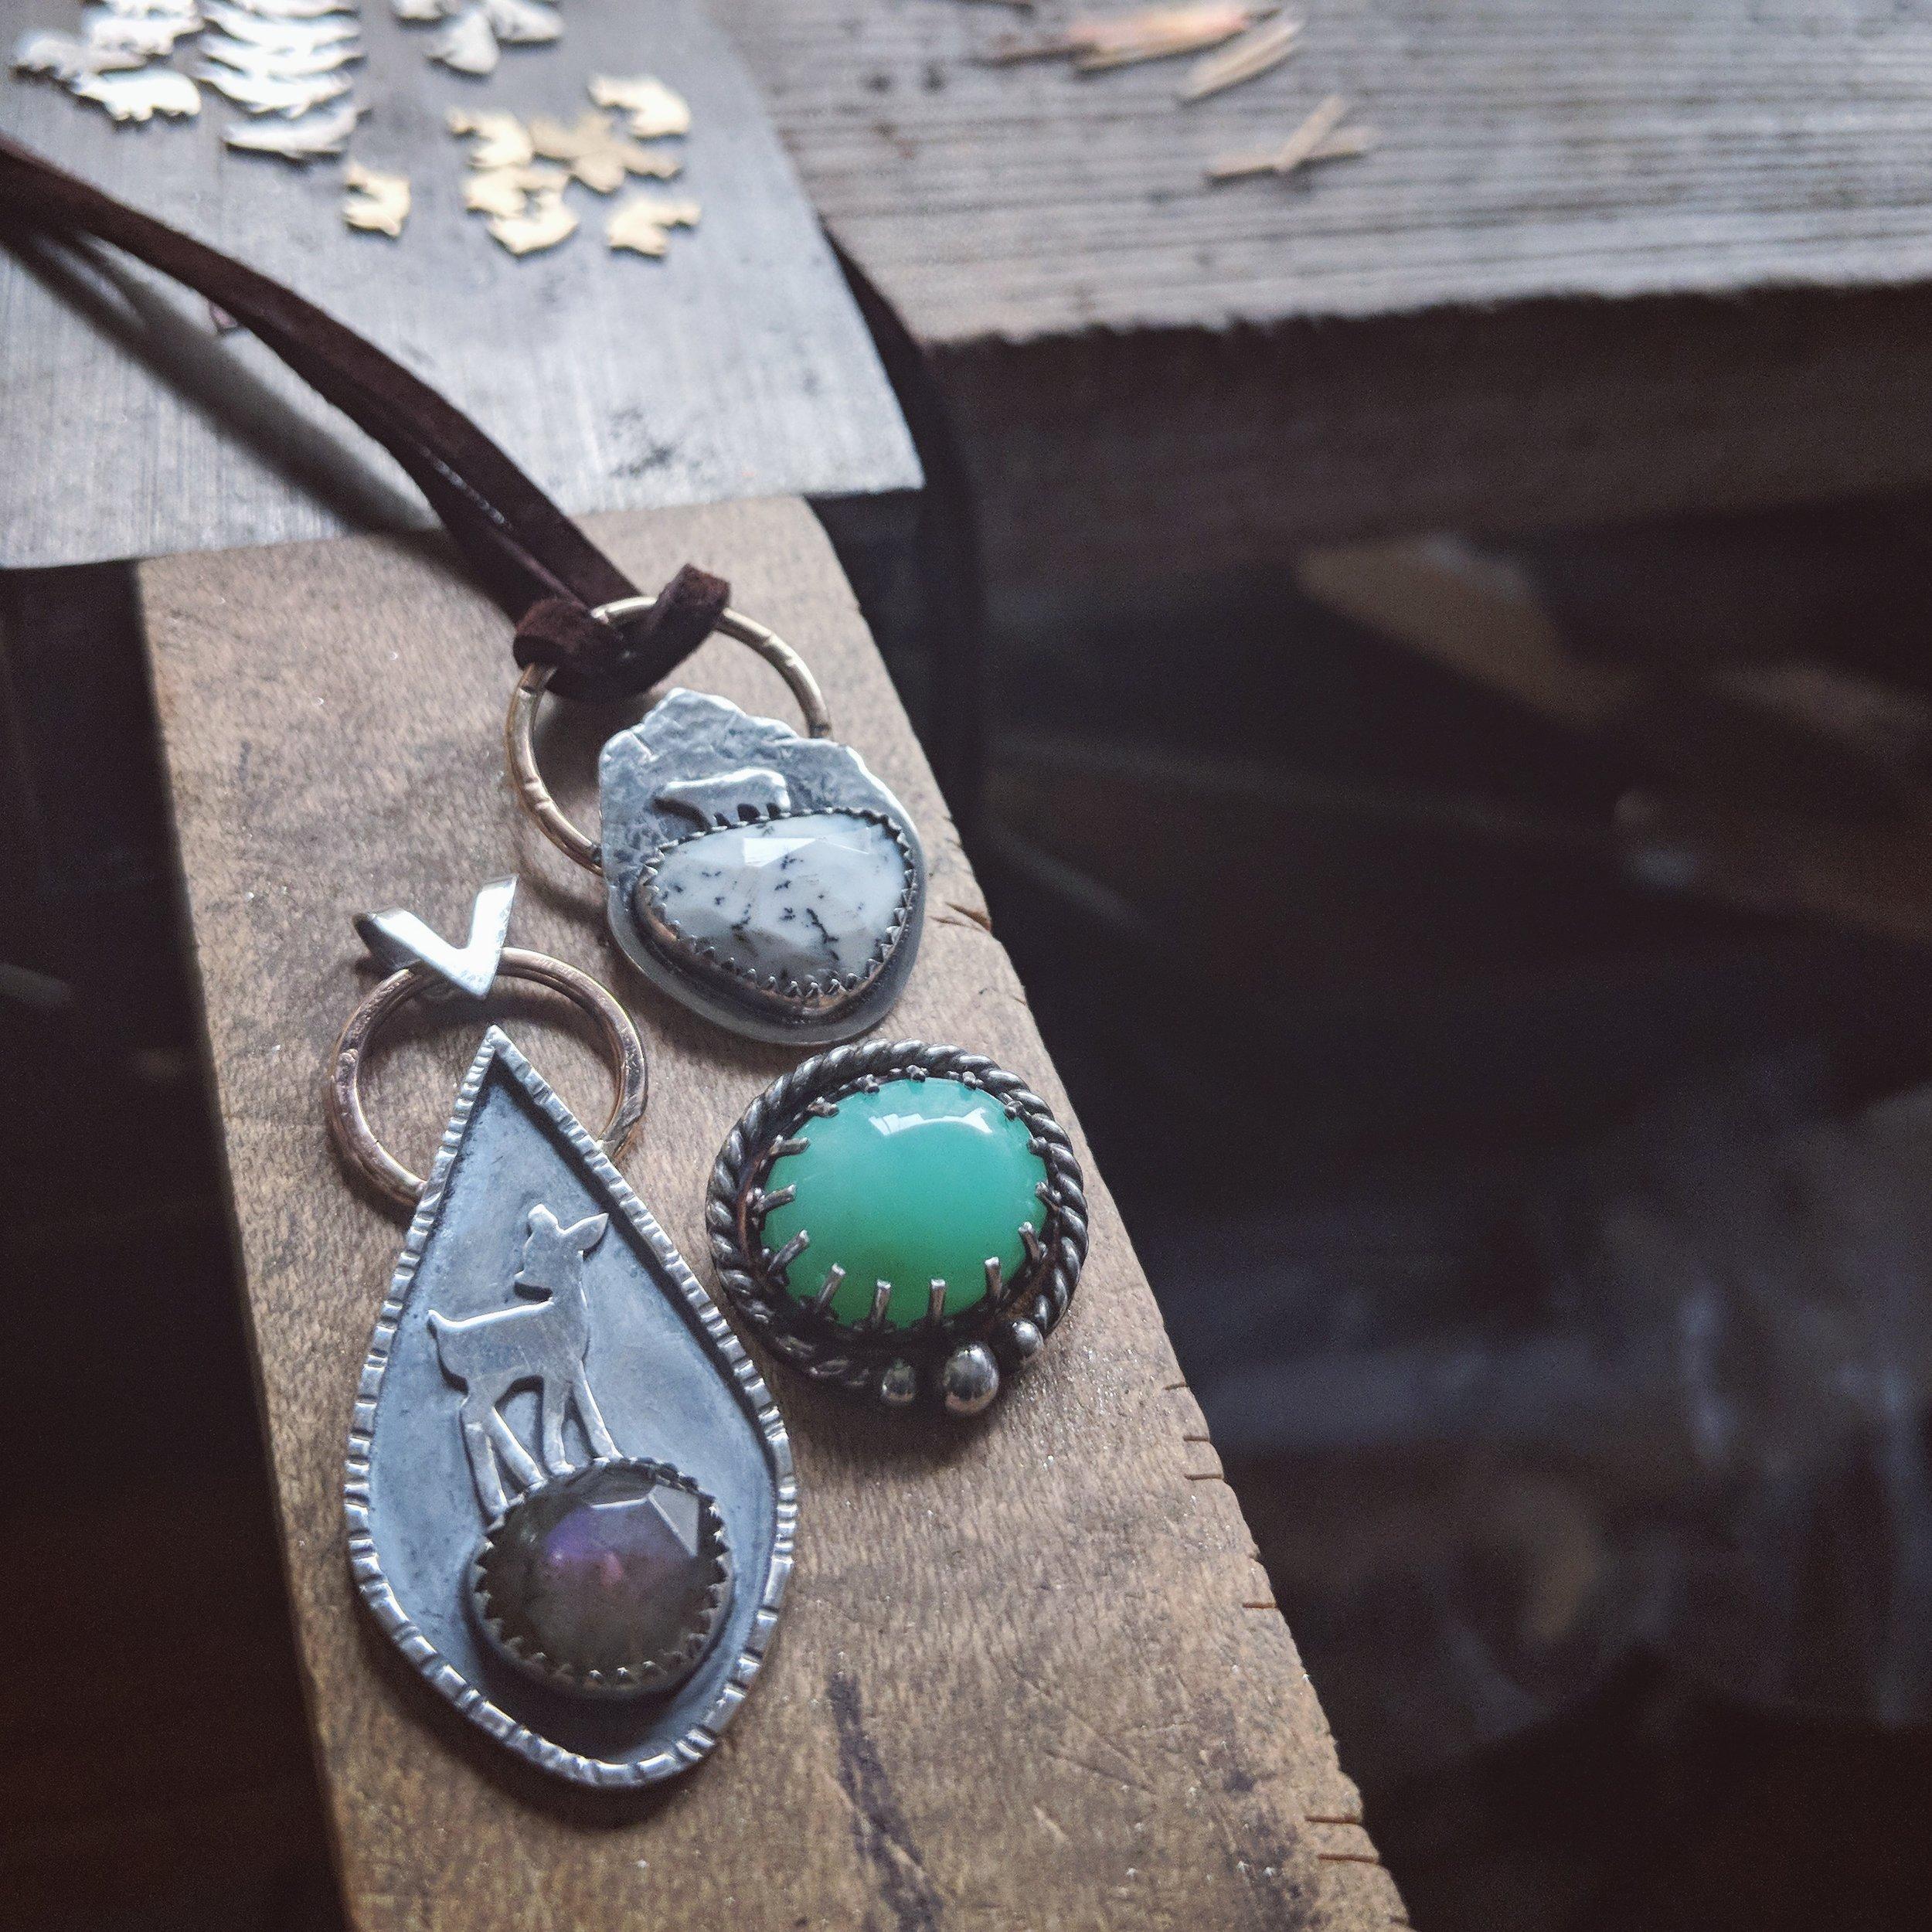 ckj-labradorite-wildlife-westcoast-fawn-chrysoprase-pendant-necklace-silver.jpg